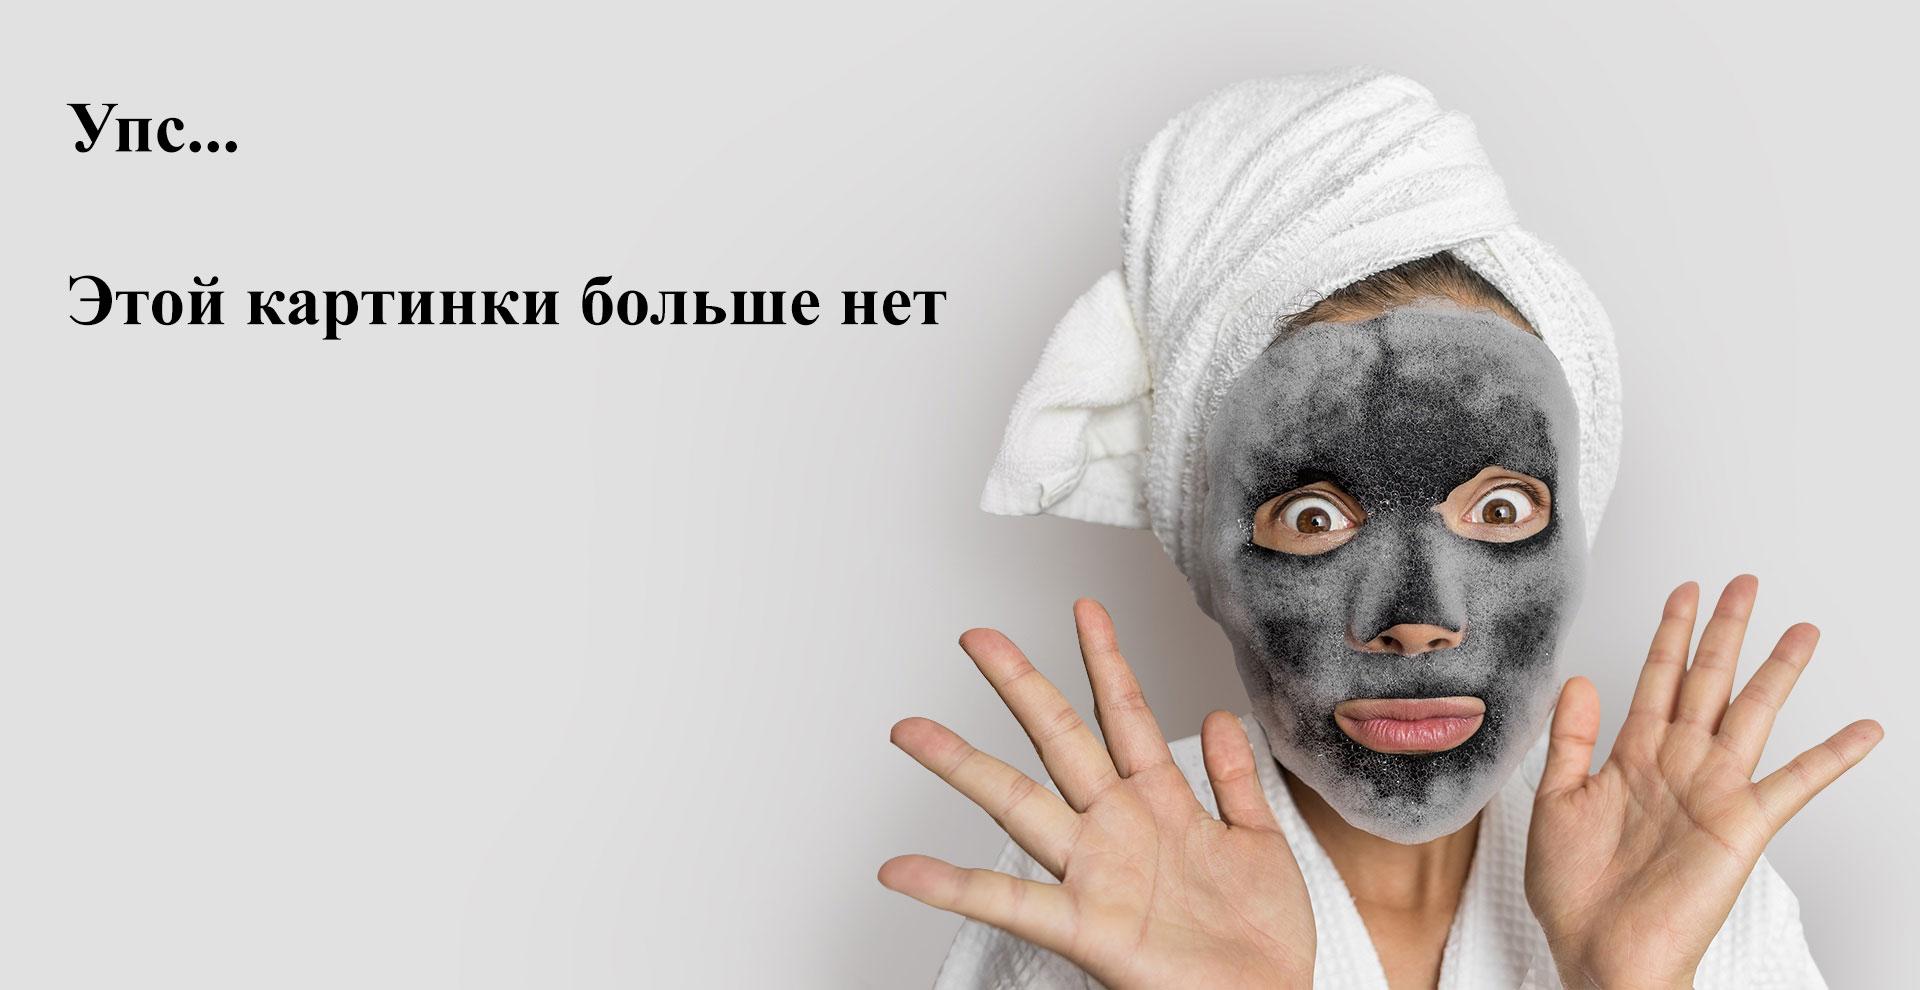 Vivienne Sabo, Губная помада Merci, тон 01